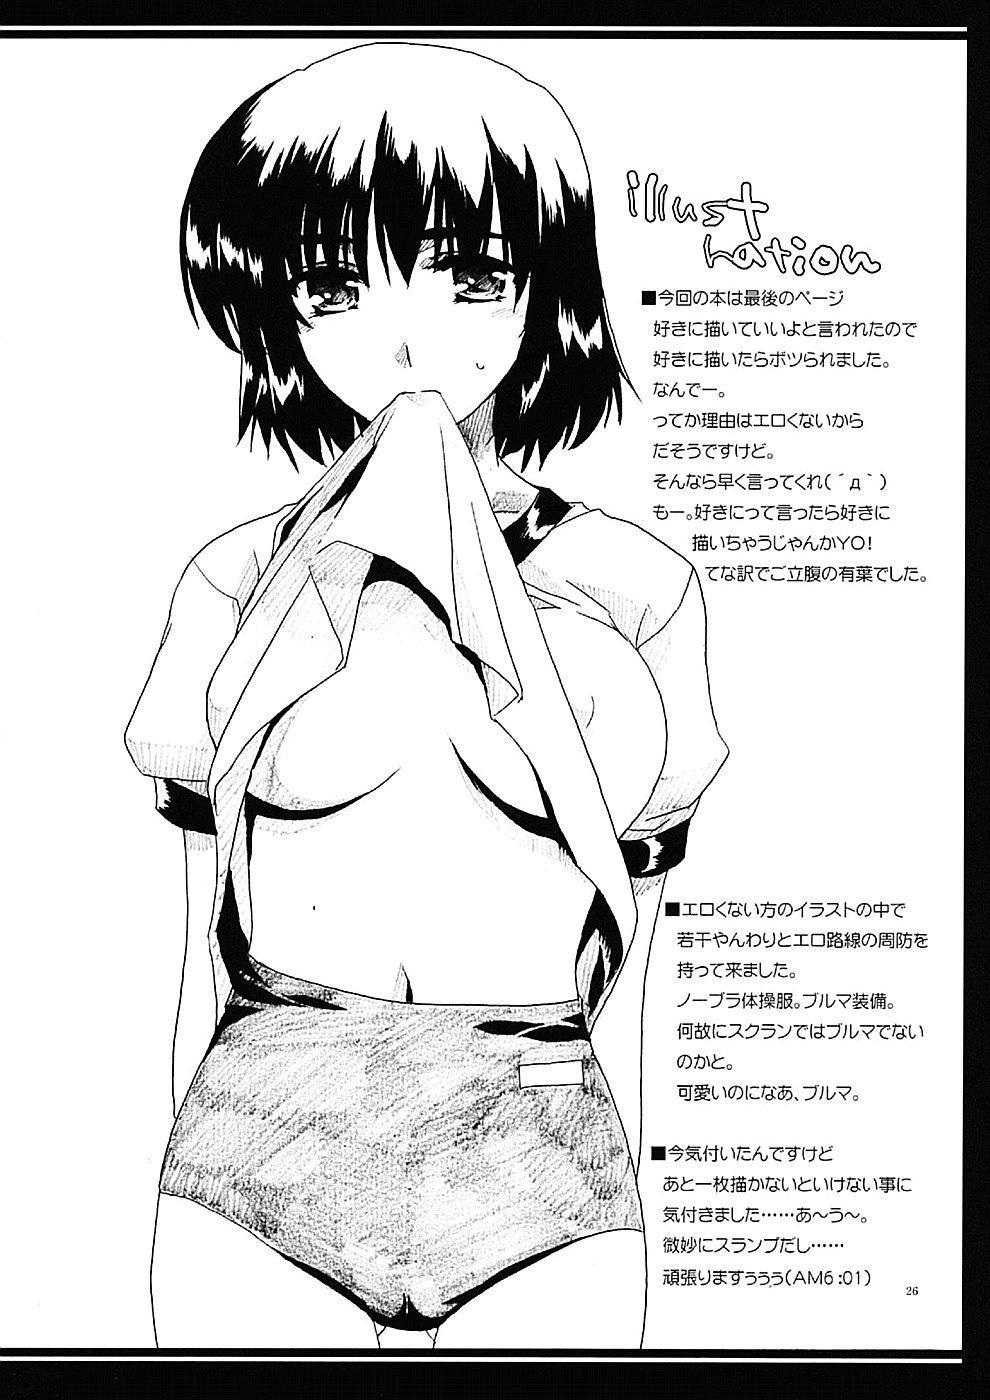 Hanazono 24